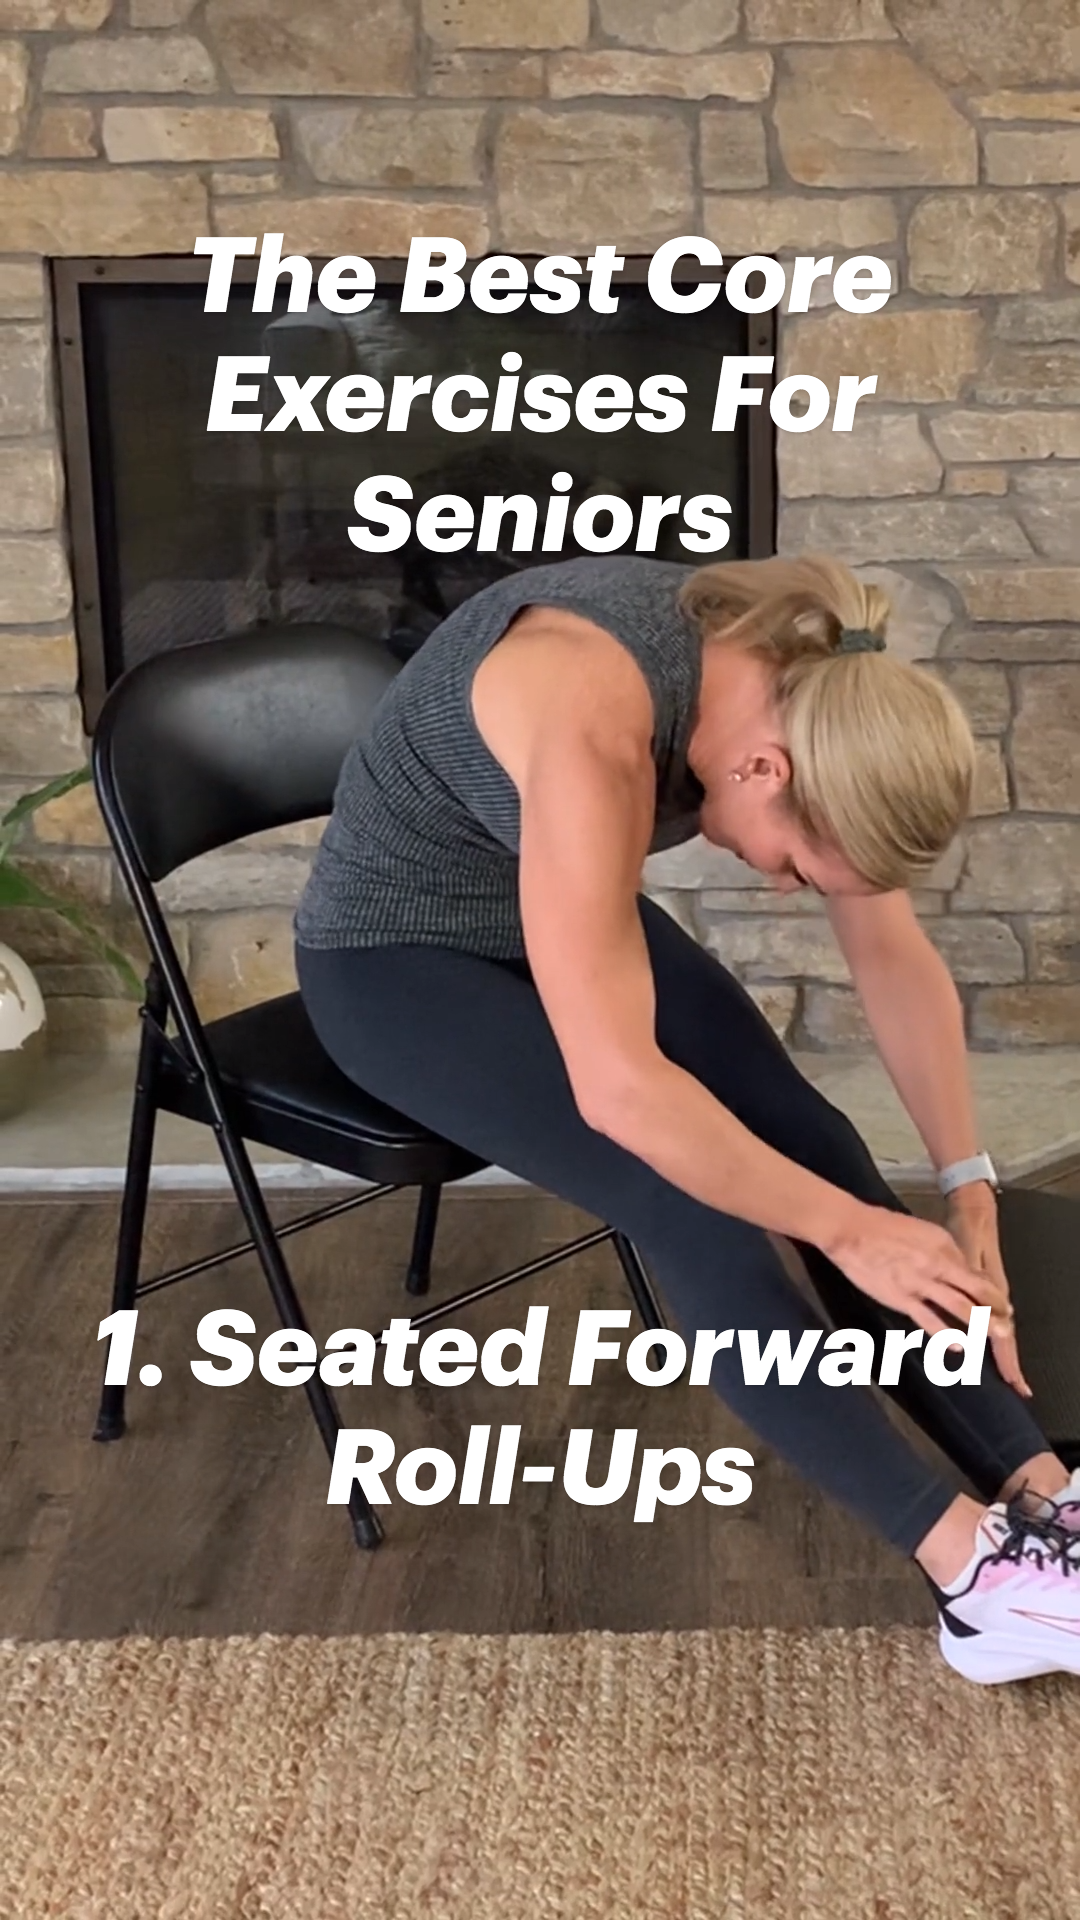 The Best Core Exercises For Seniors